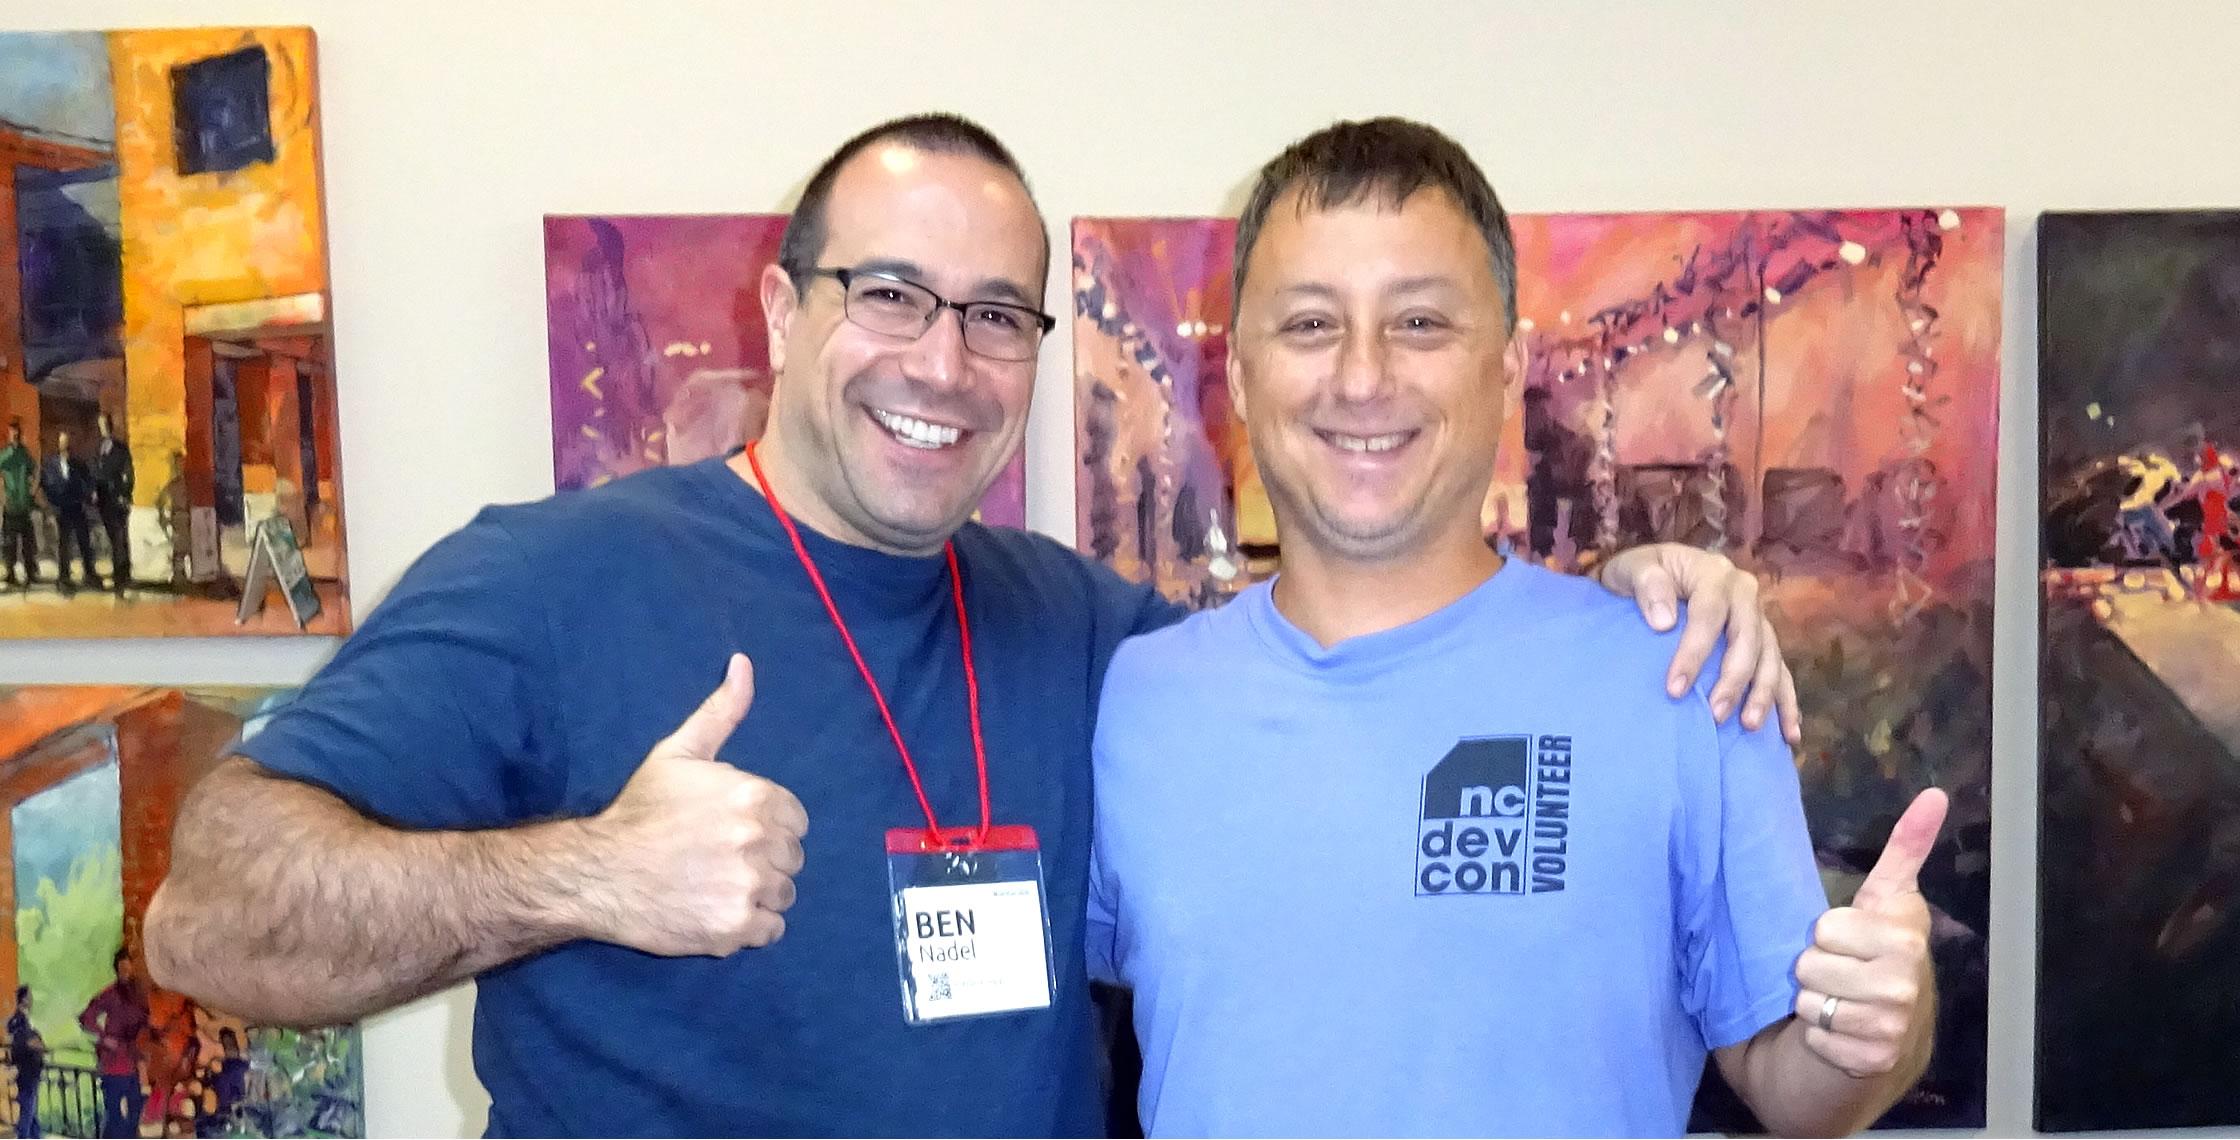 Ben Nadel at NCDevCon 2016 (Raleigh, NC) with: Dan Wilson